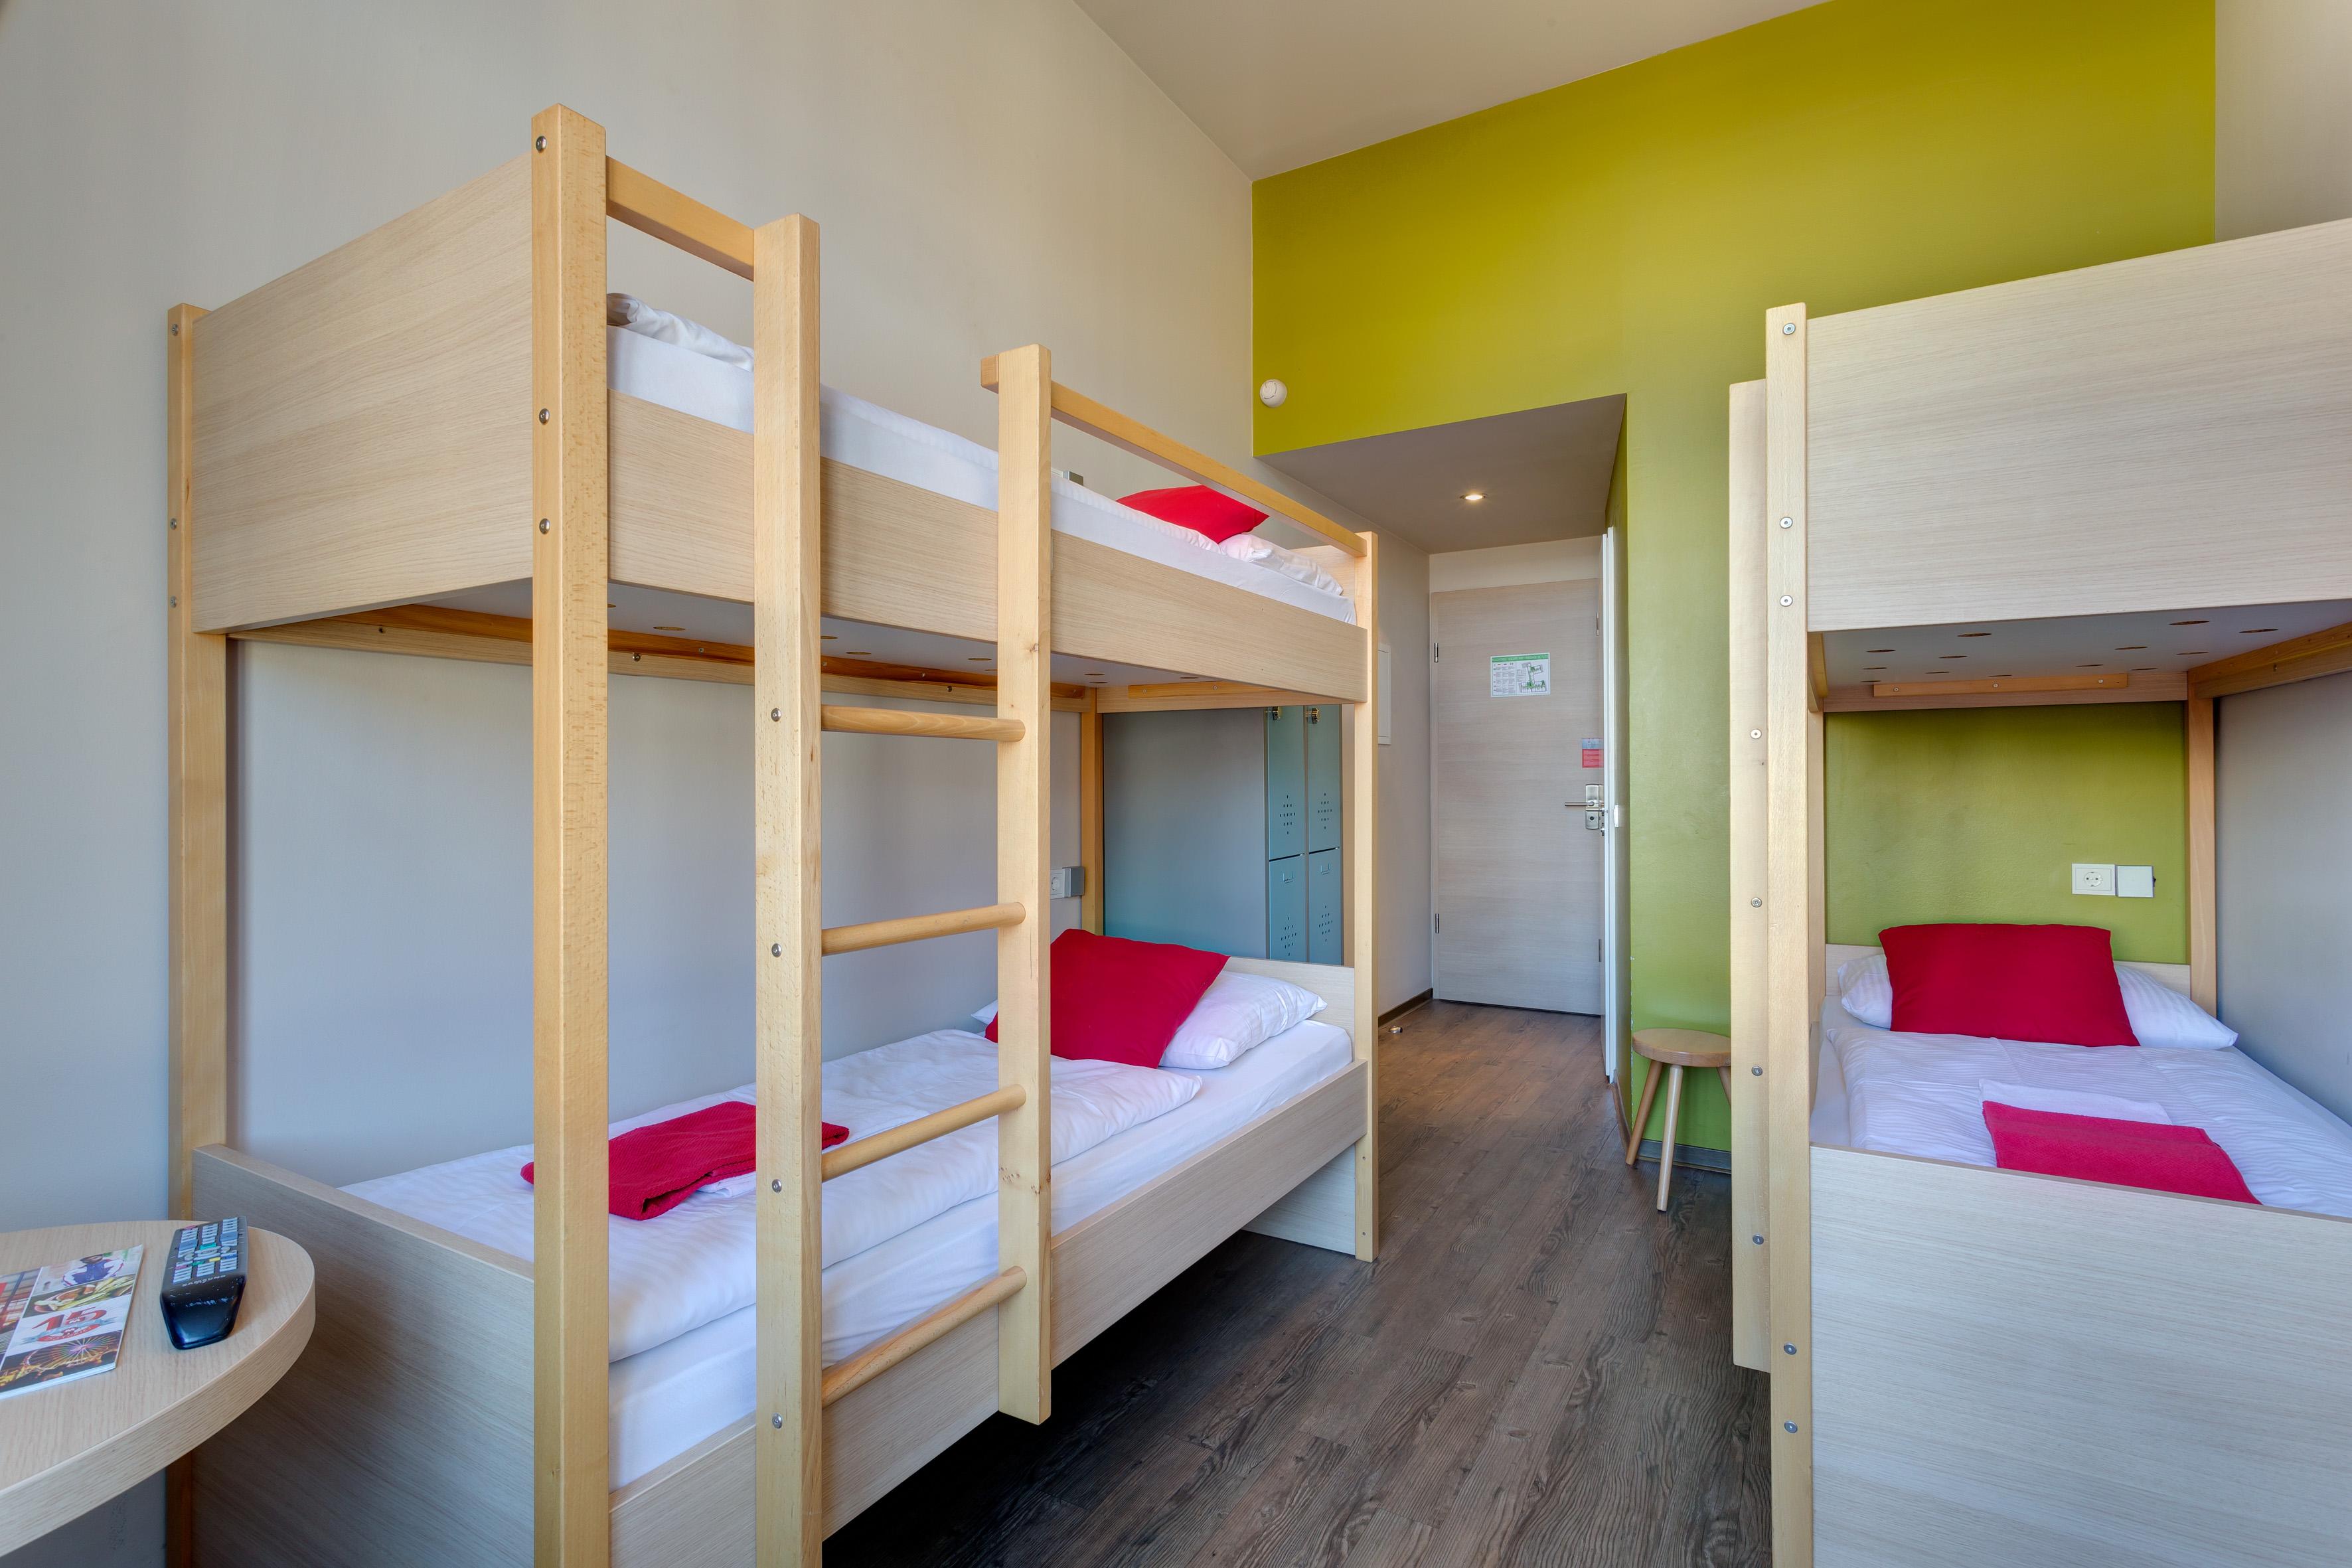 MEININGER Hotel Berlin Mitte - Dormitory